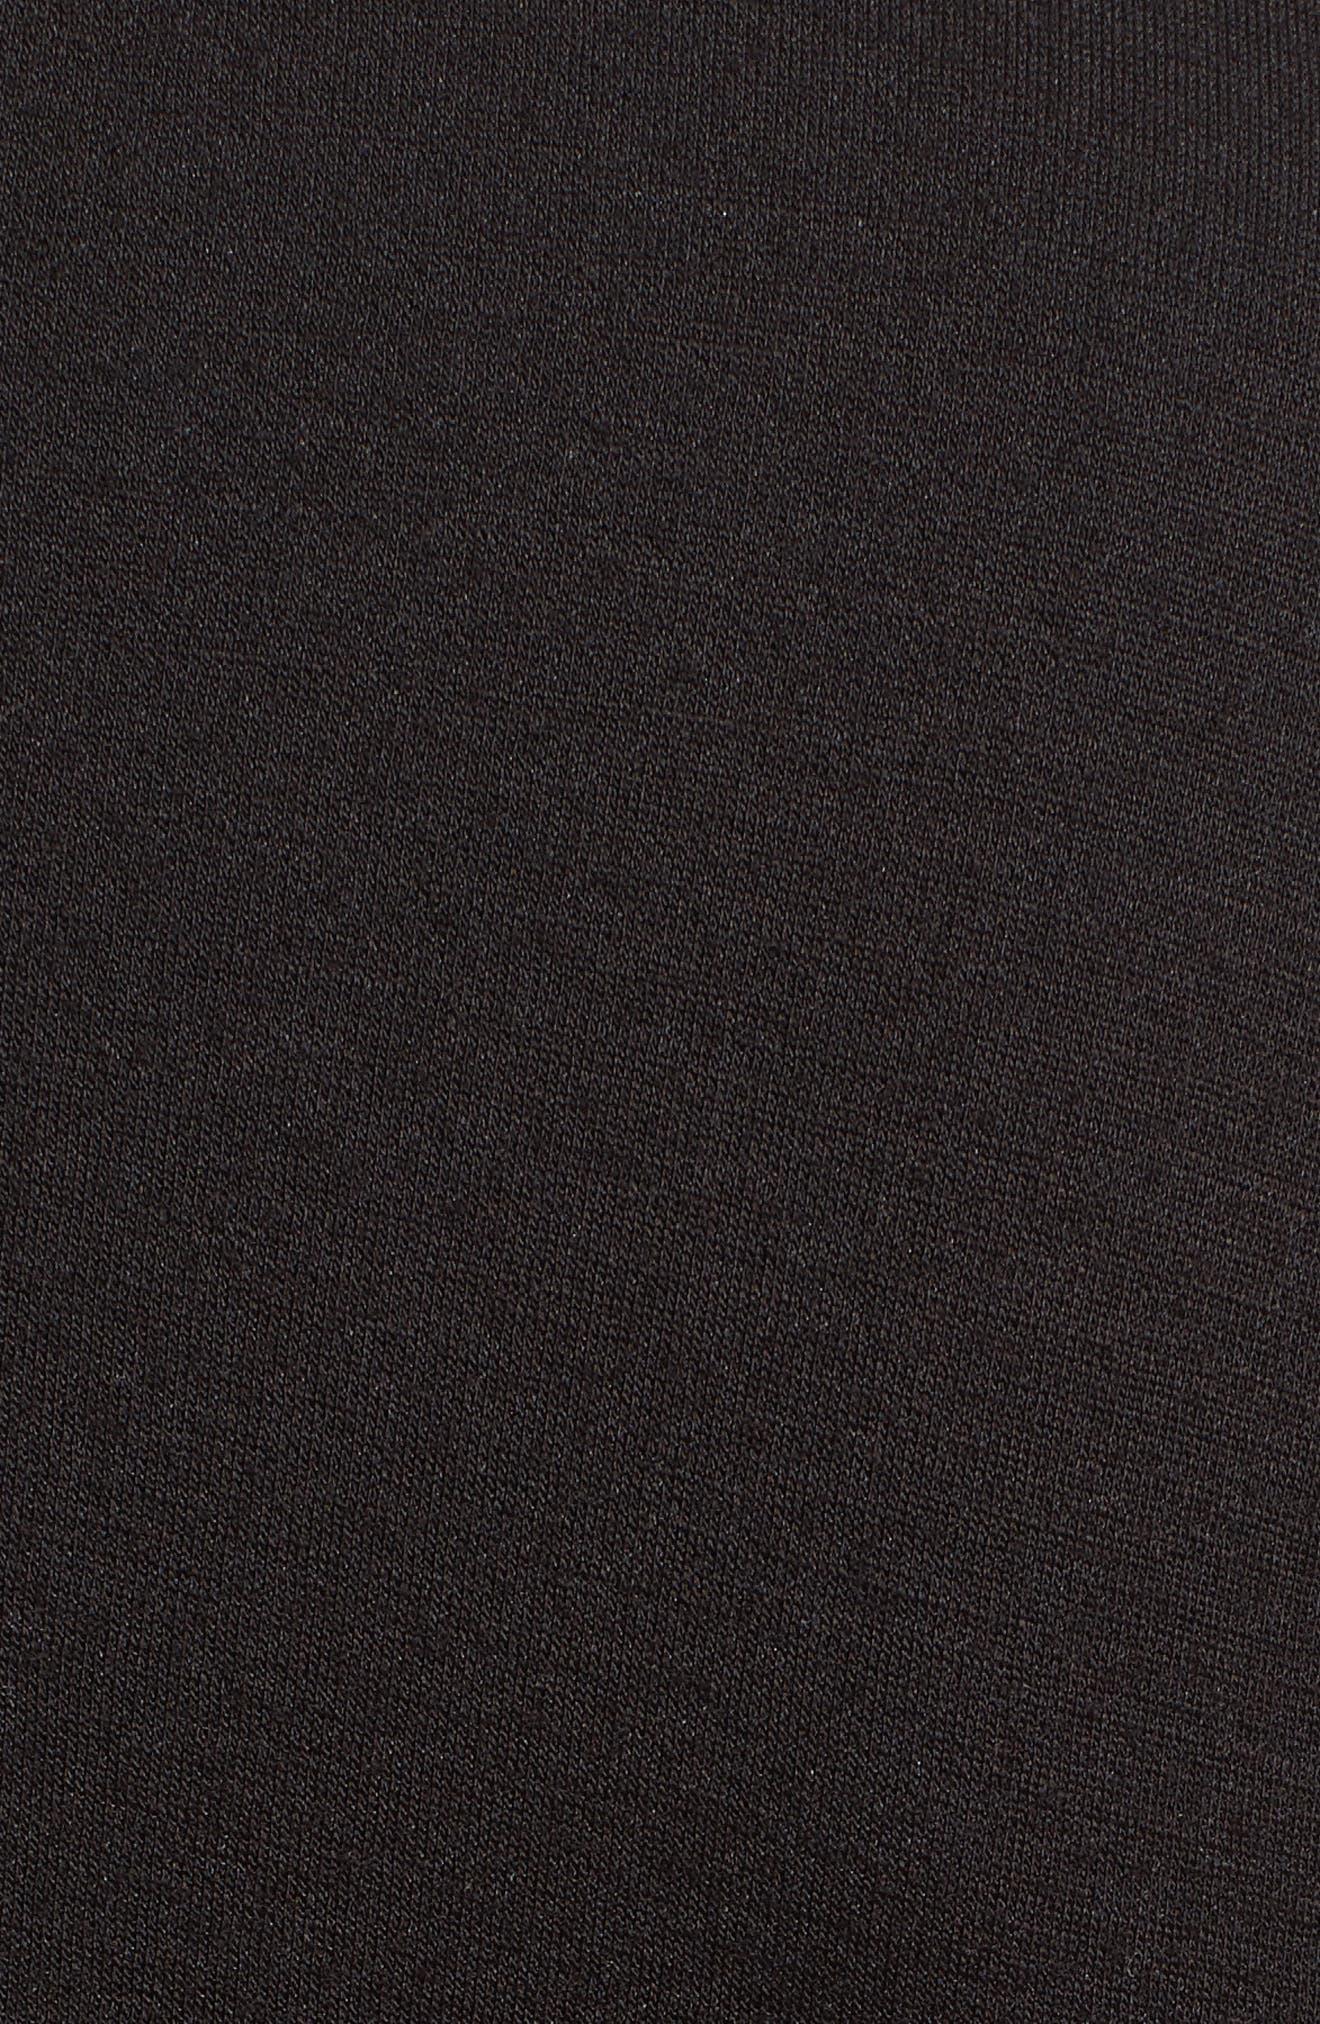 Asymmetrical Fit & Flare Dress,                             Alternate thumbnail 5, color,                             001